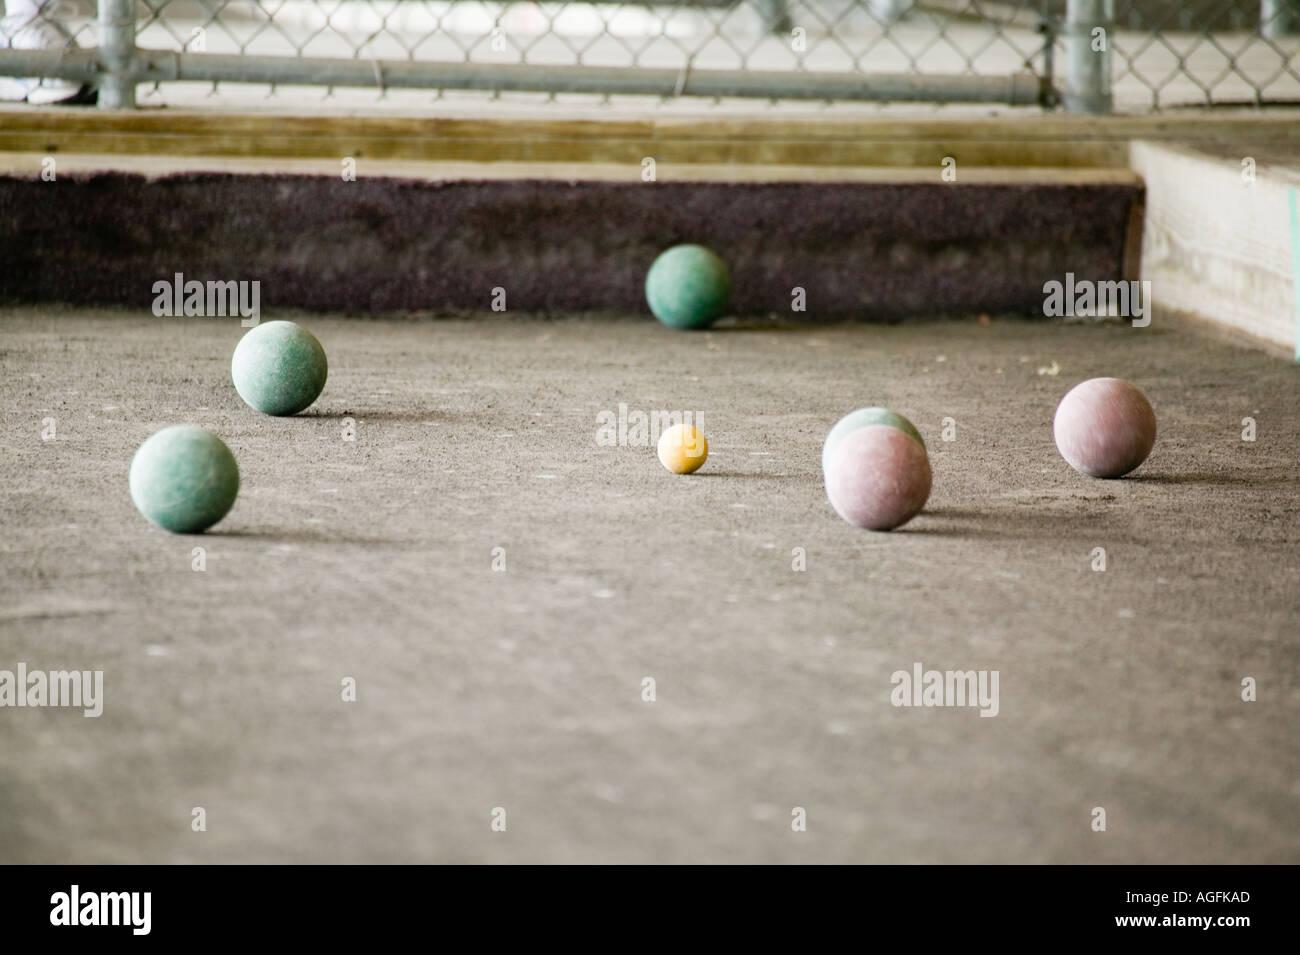 Bocce tournament Rome New York - Stock Image